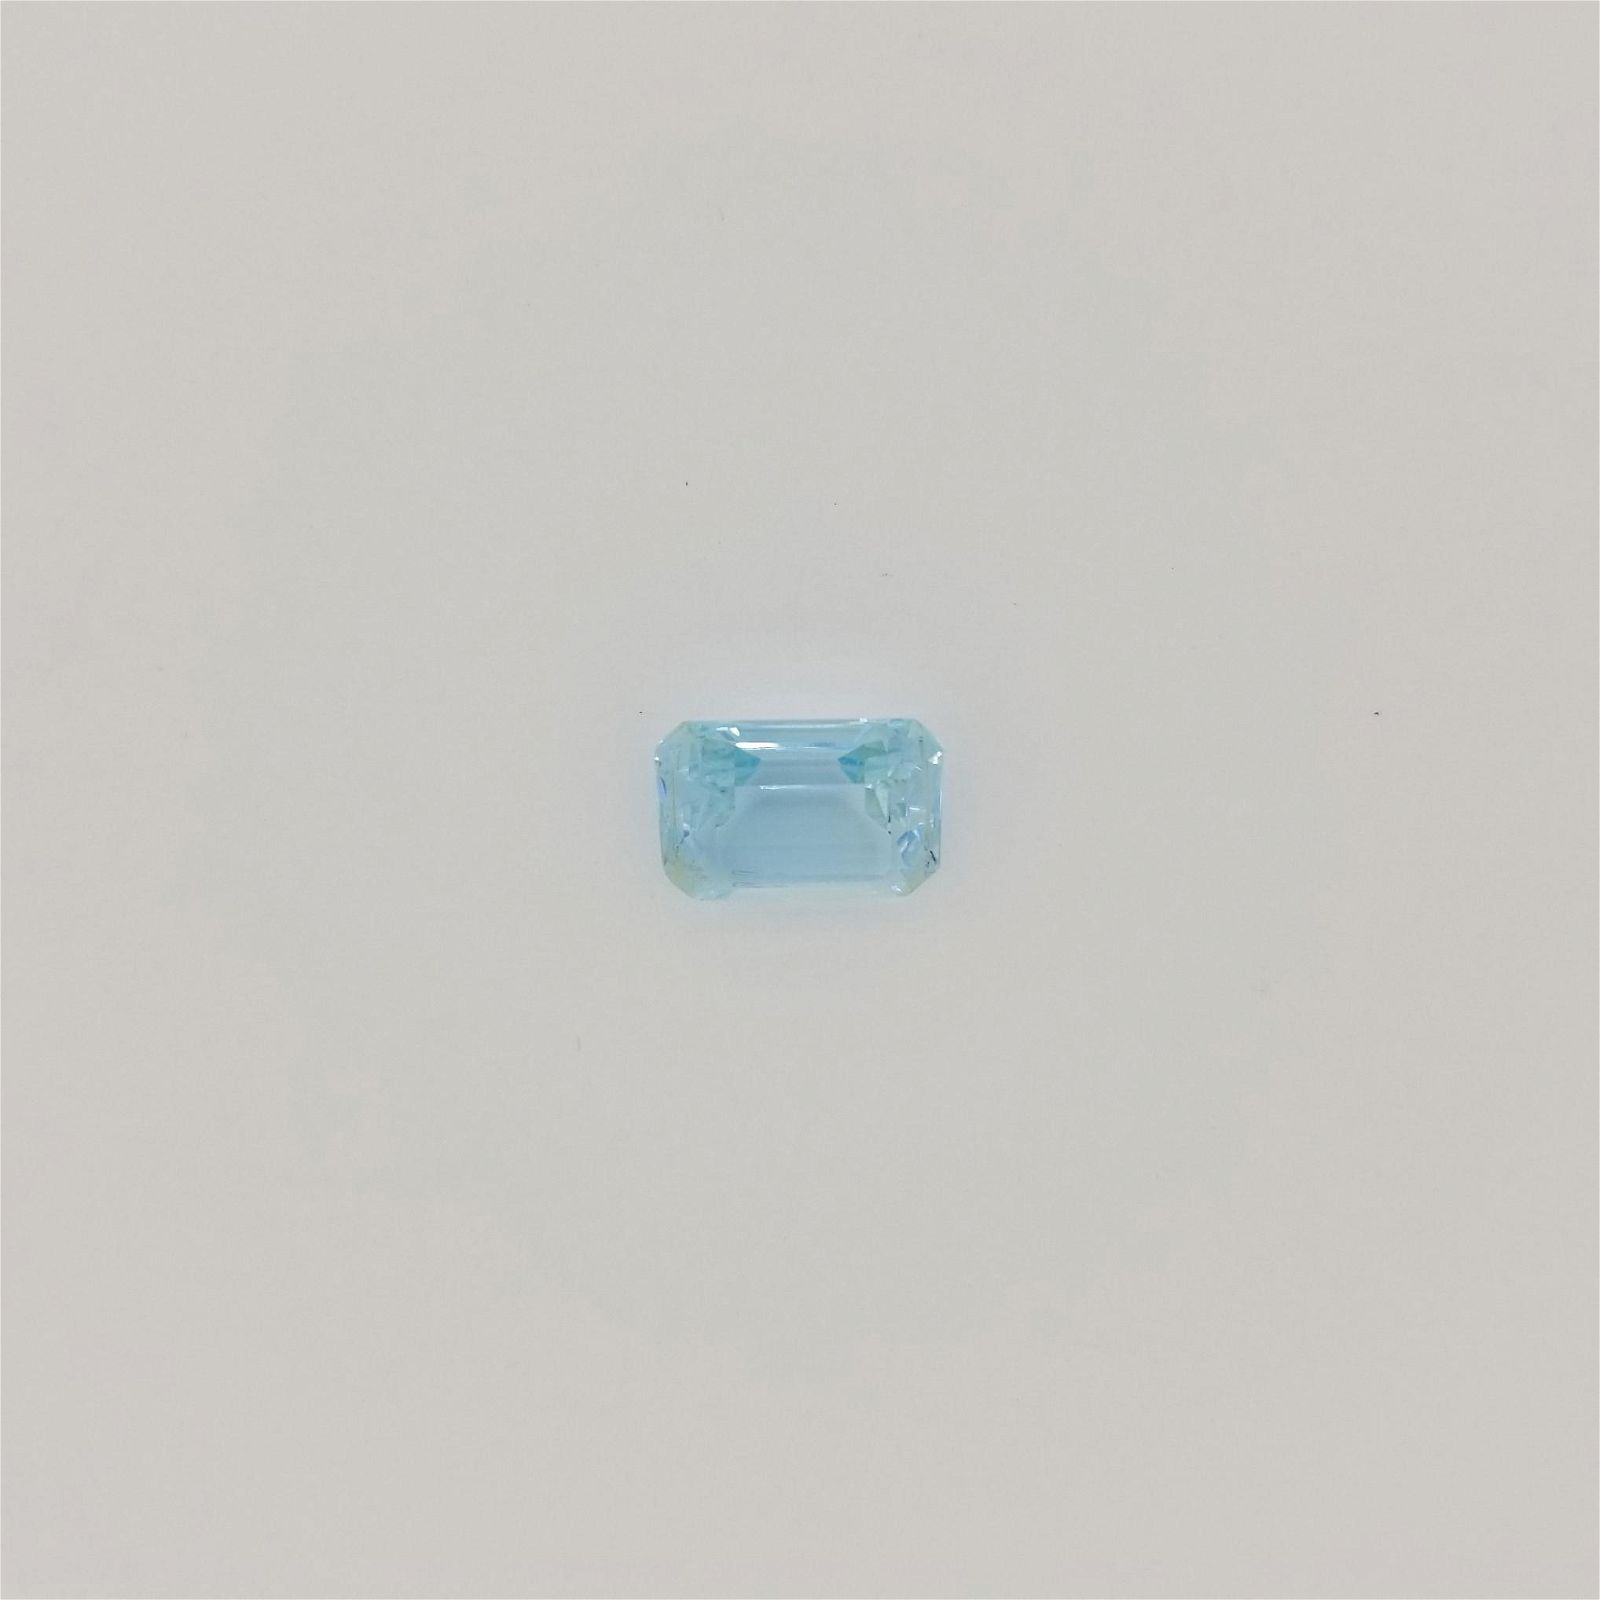 13.4 cts Blue Topaz